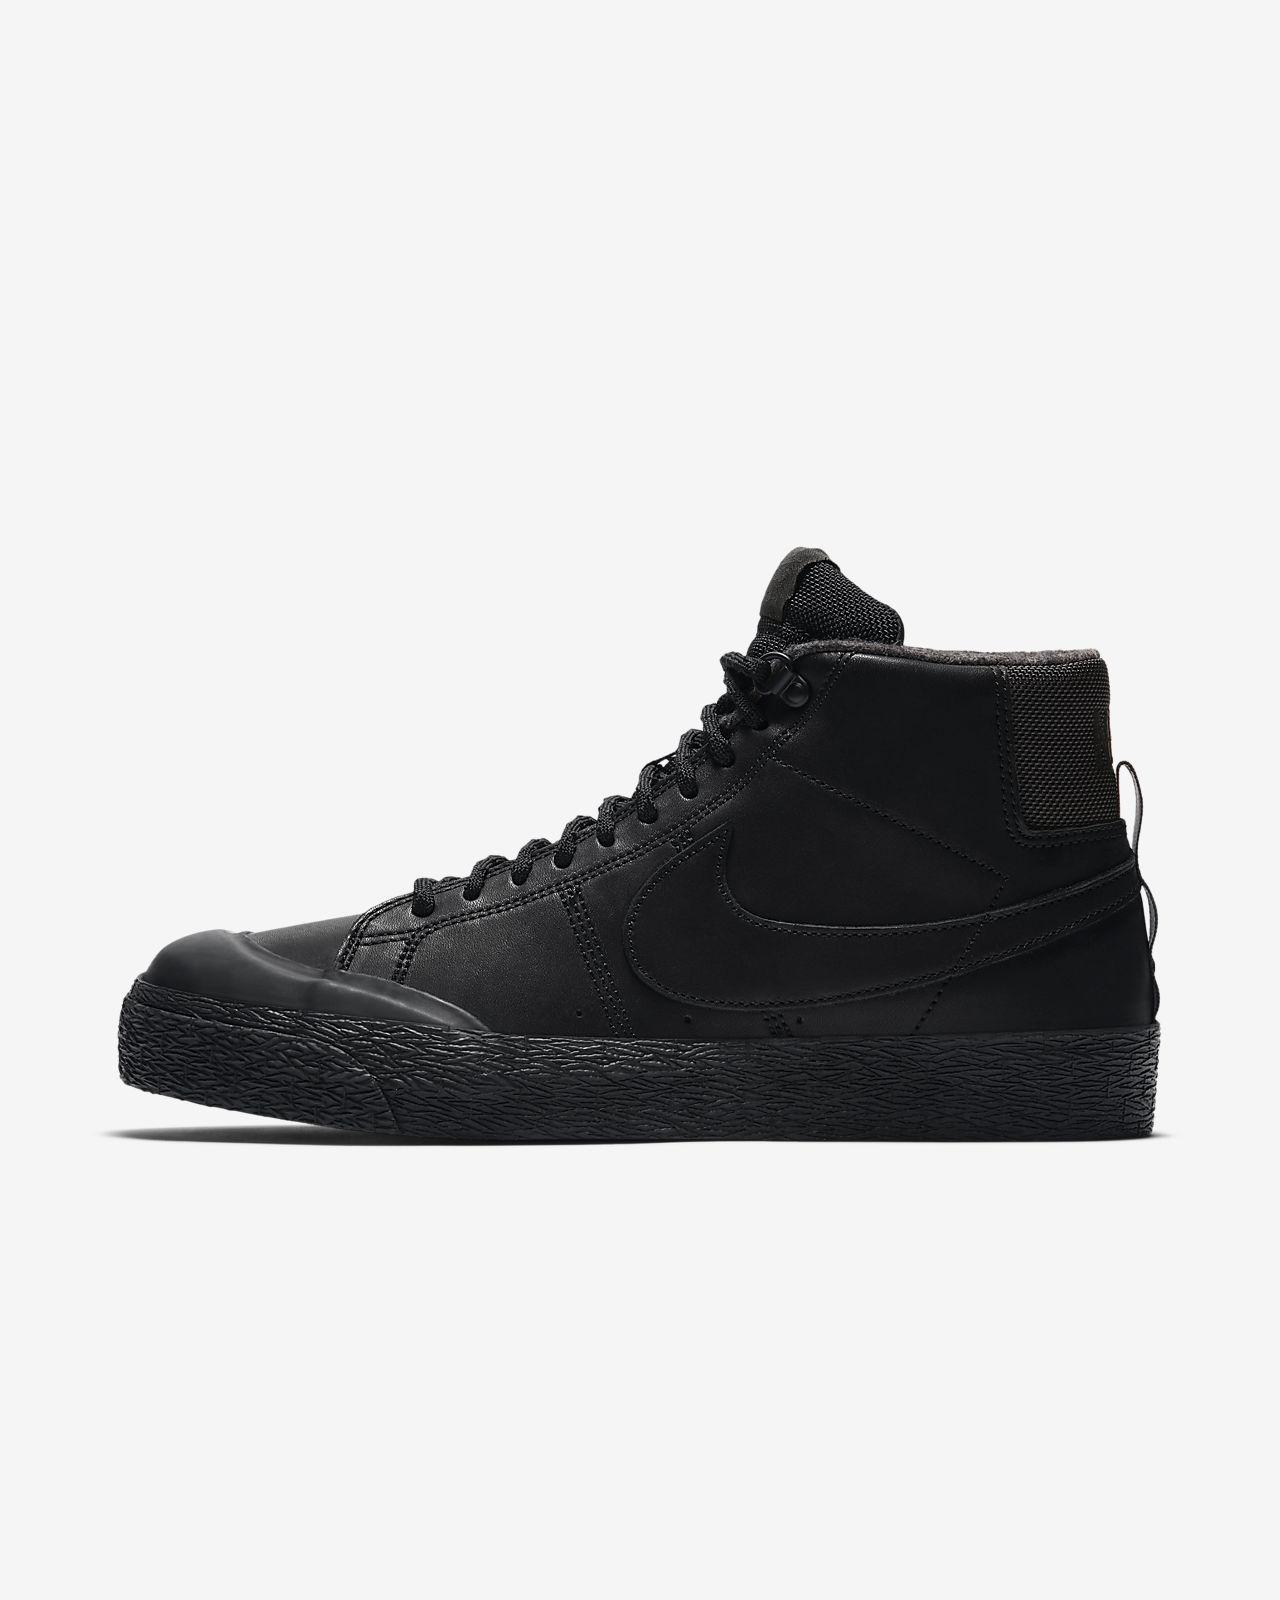 d0de1cab600b Nike SB Zoom Blazer Mid XT Bota Men s Skateboarding Shoe